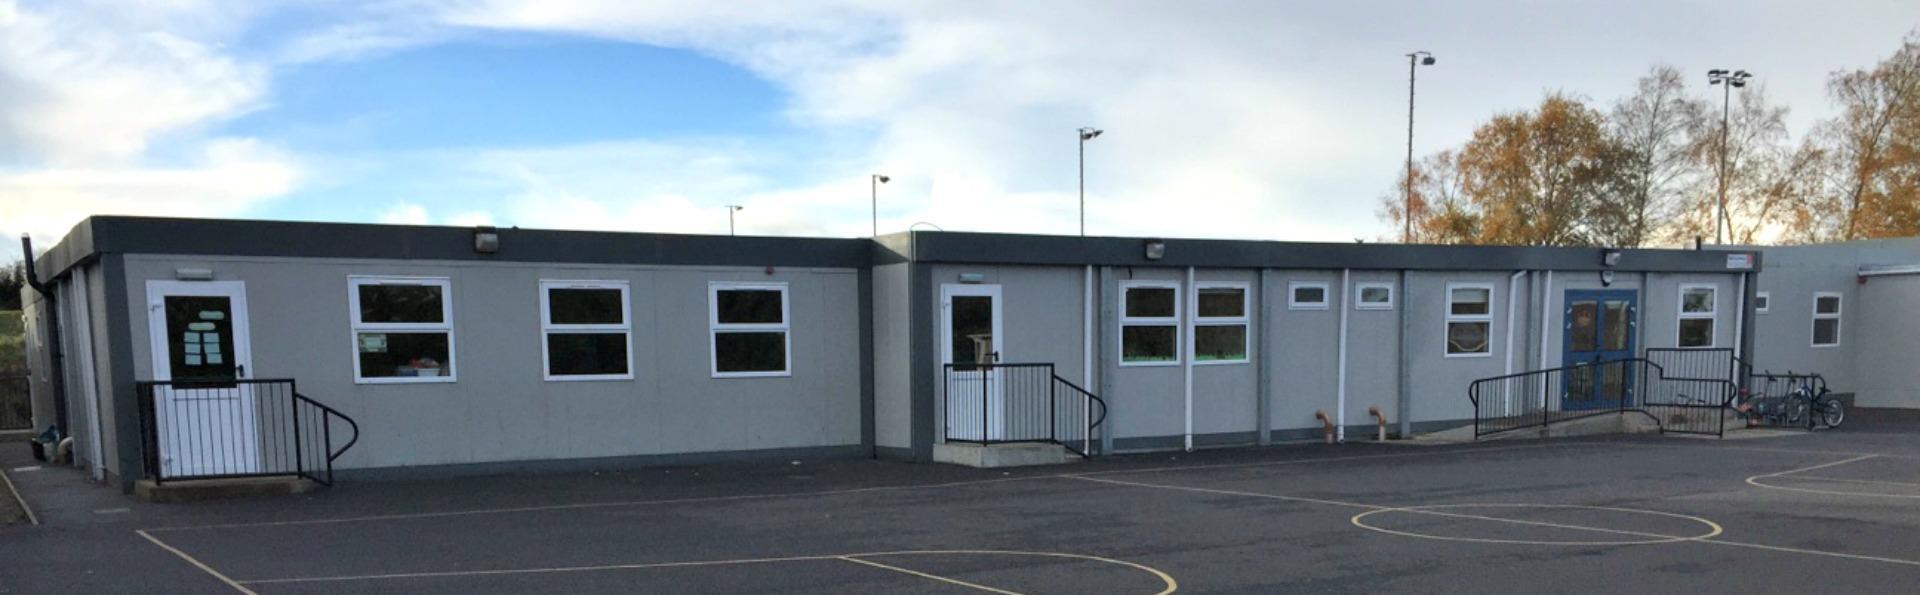 Instaspace provided a solution for Ard Rí Community School